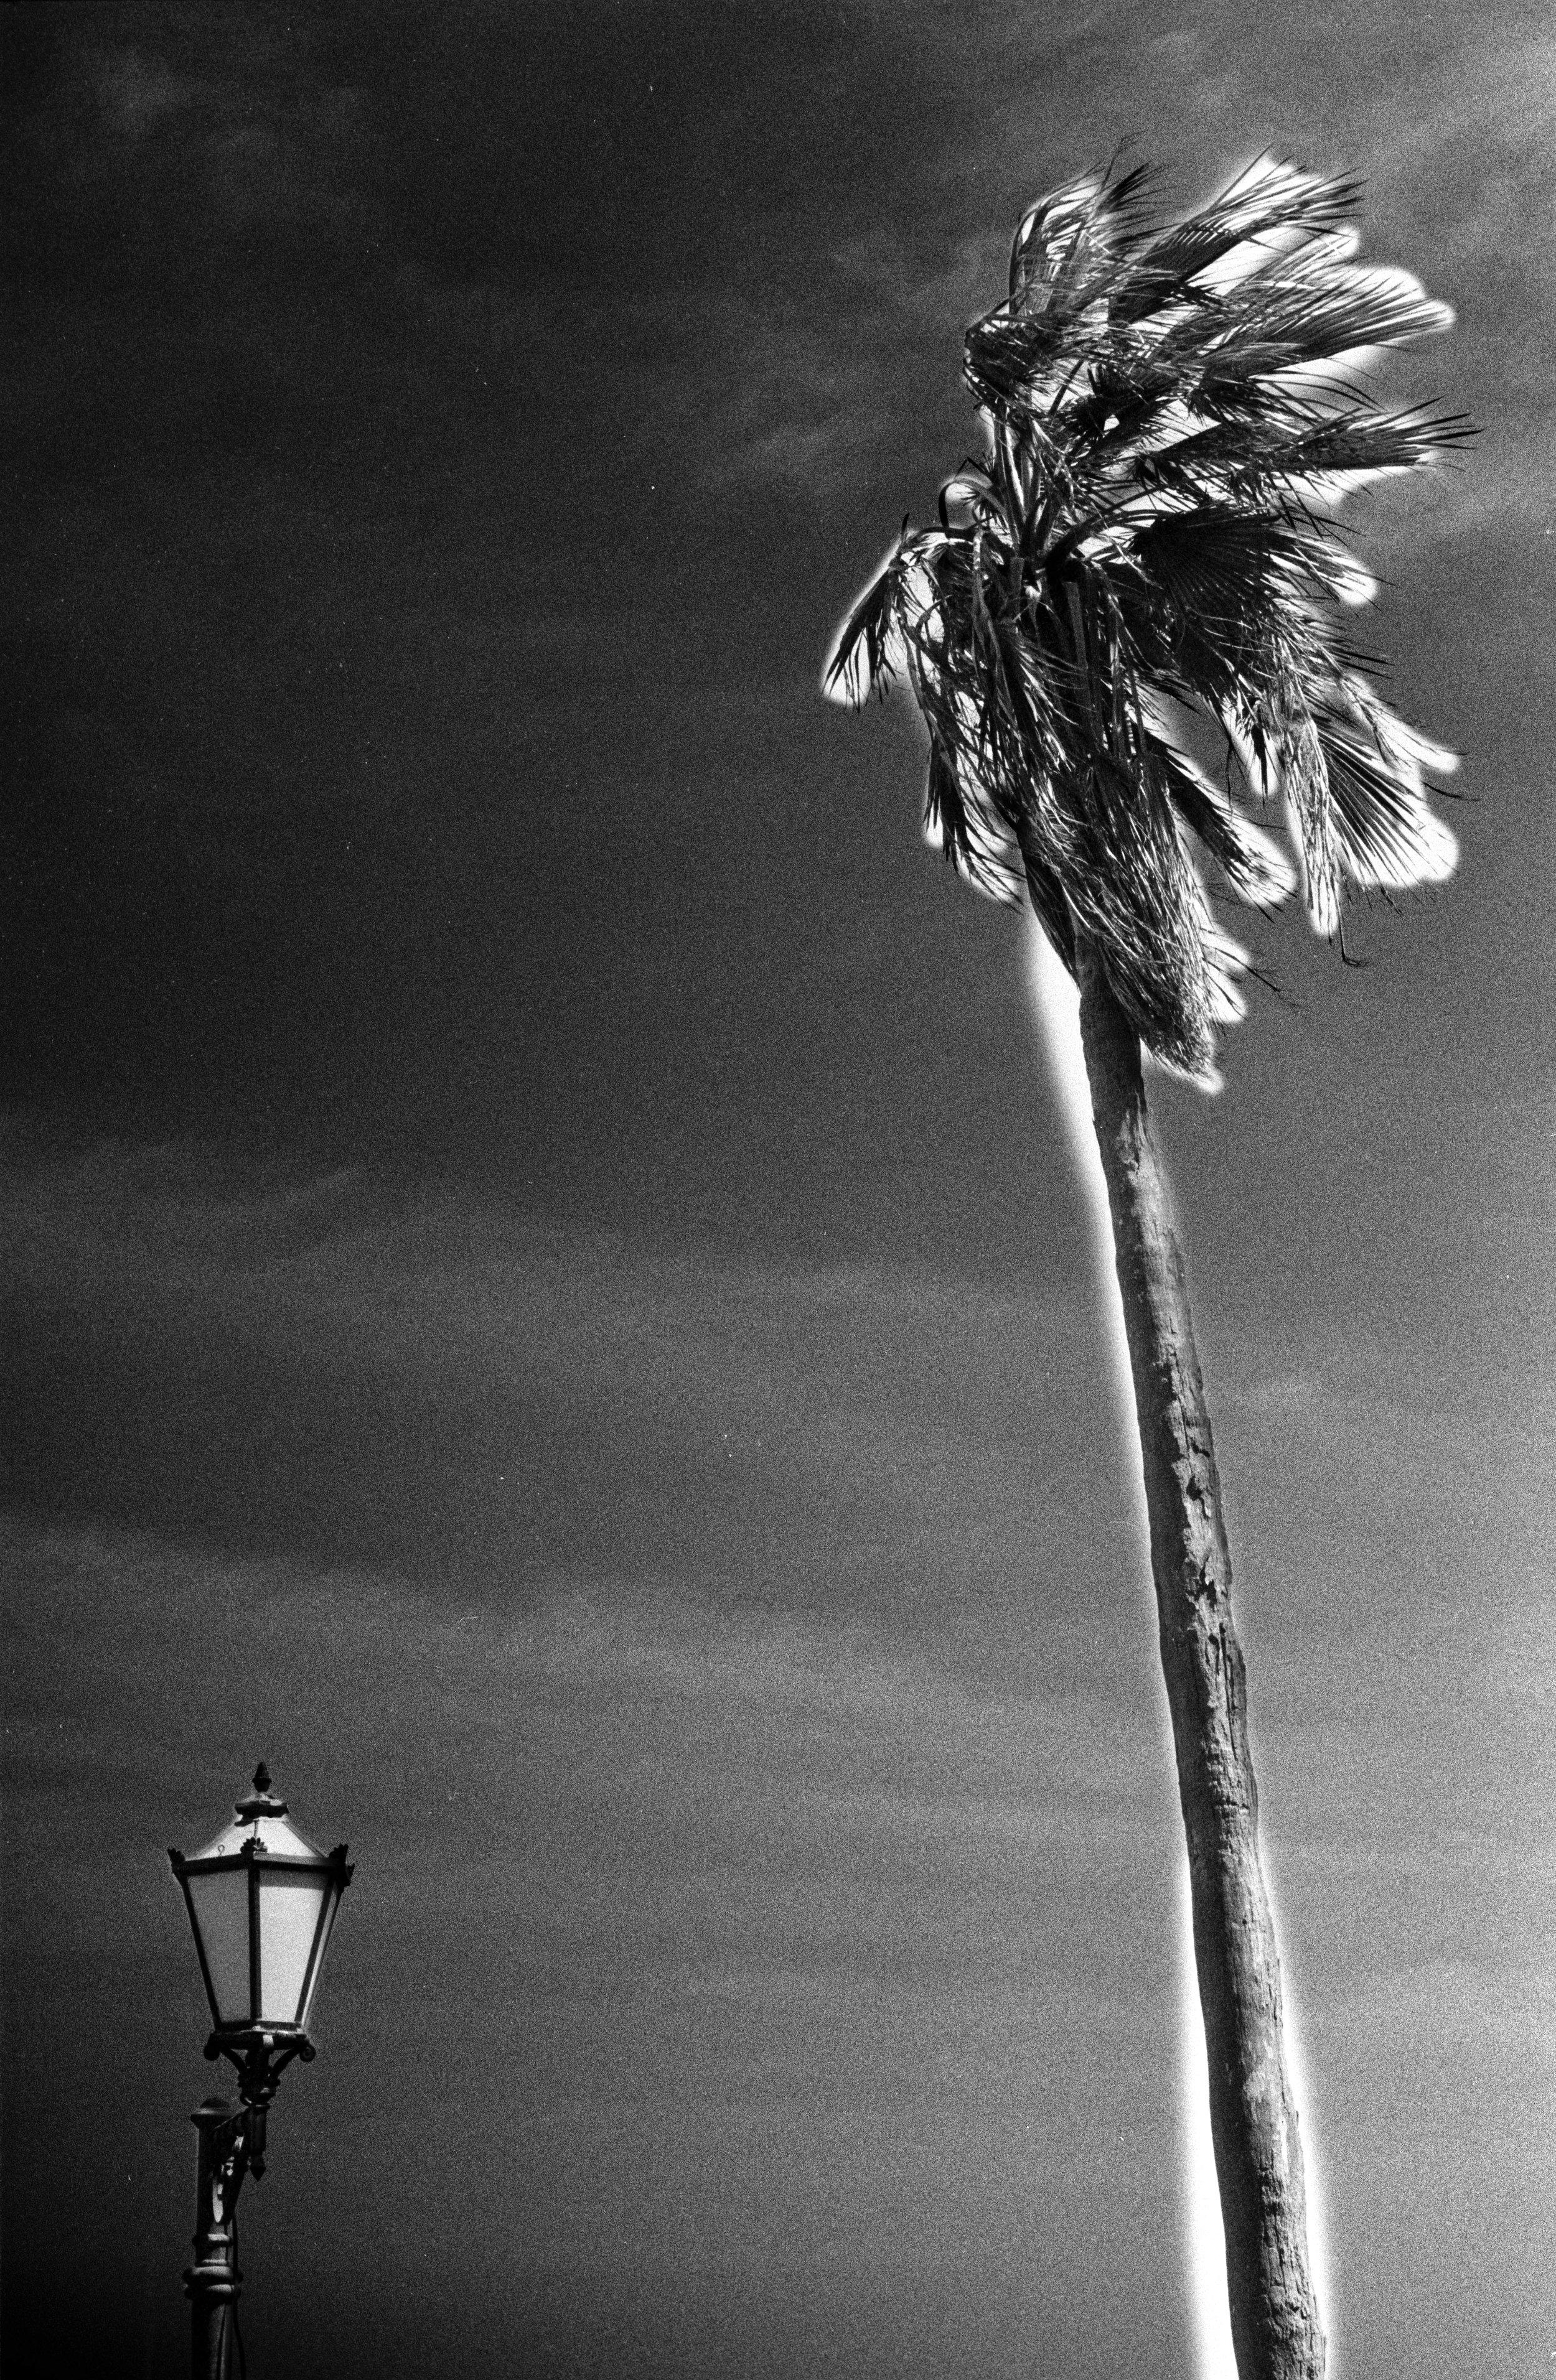 Erections - Sometimes we need shadow, sometimes light.